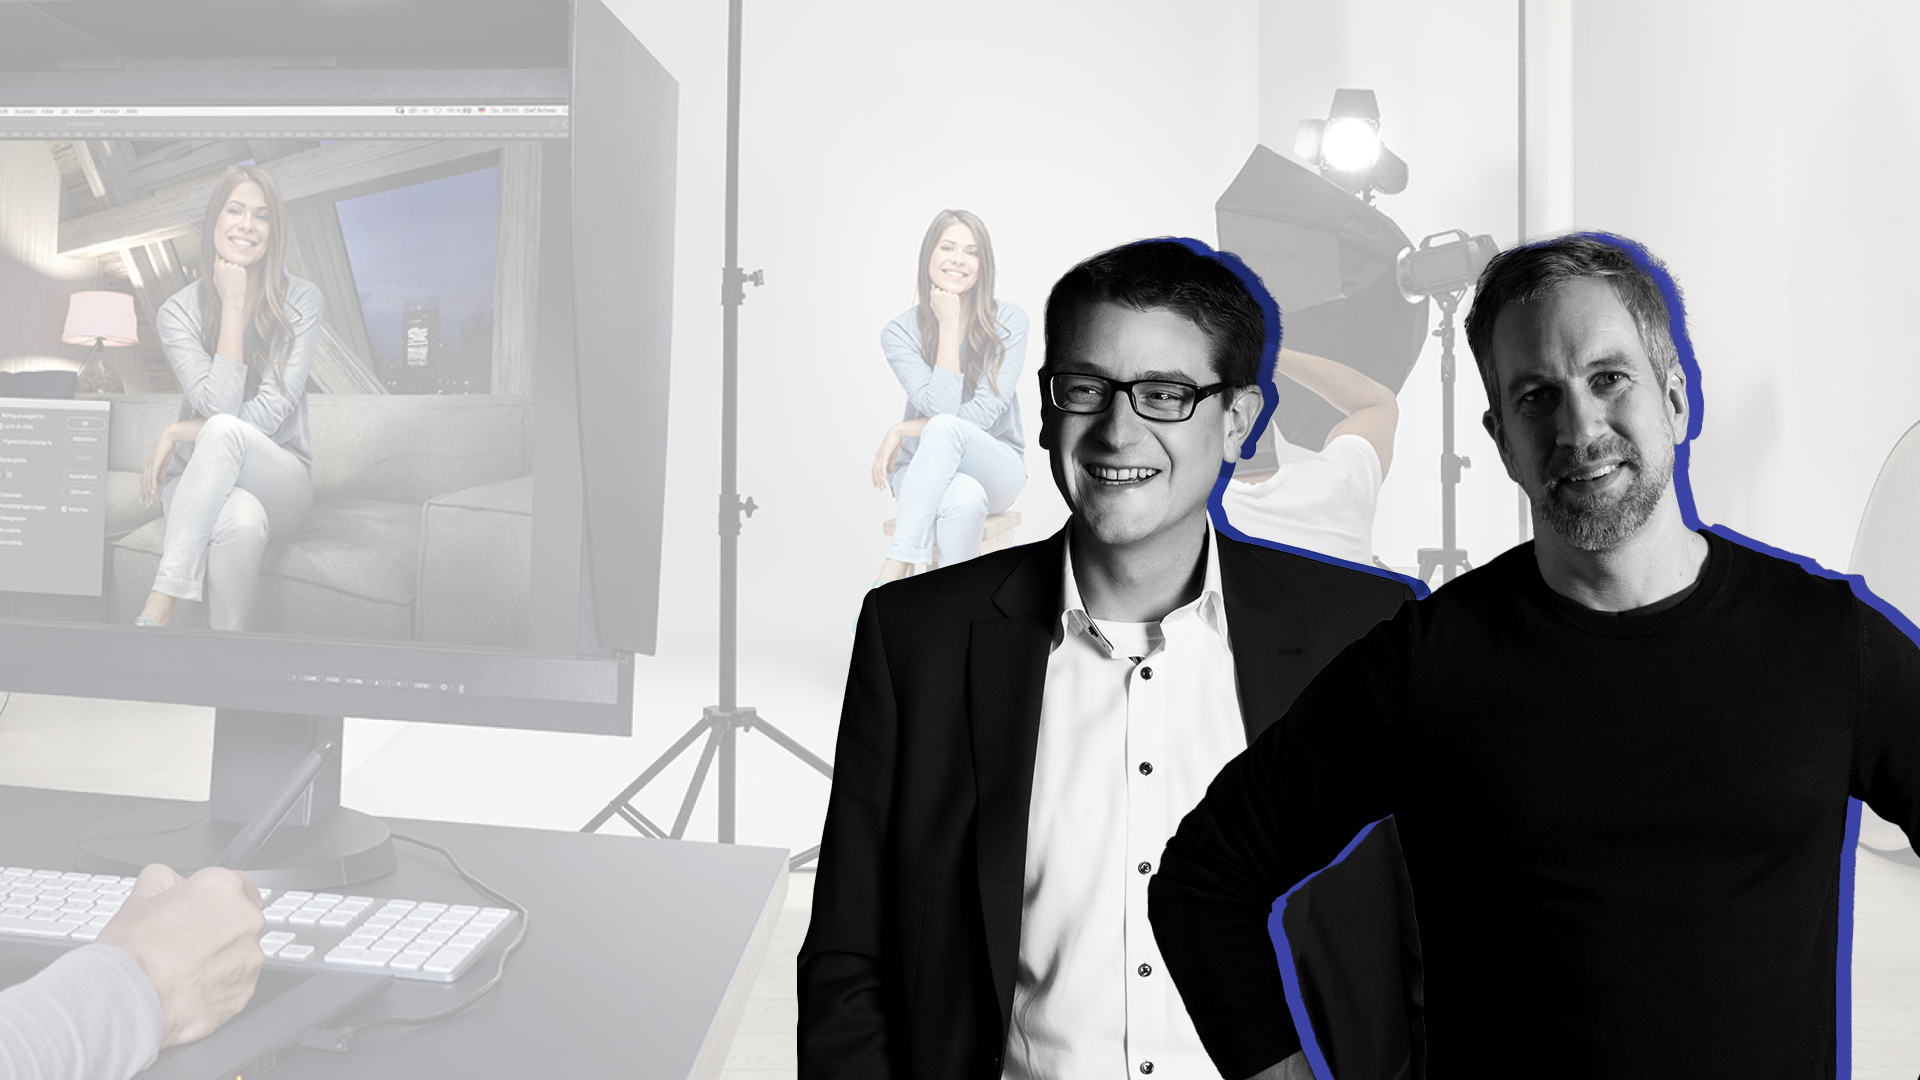 VIDEO: M+M-TrendFlash: Virtual Studio